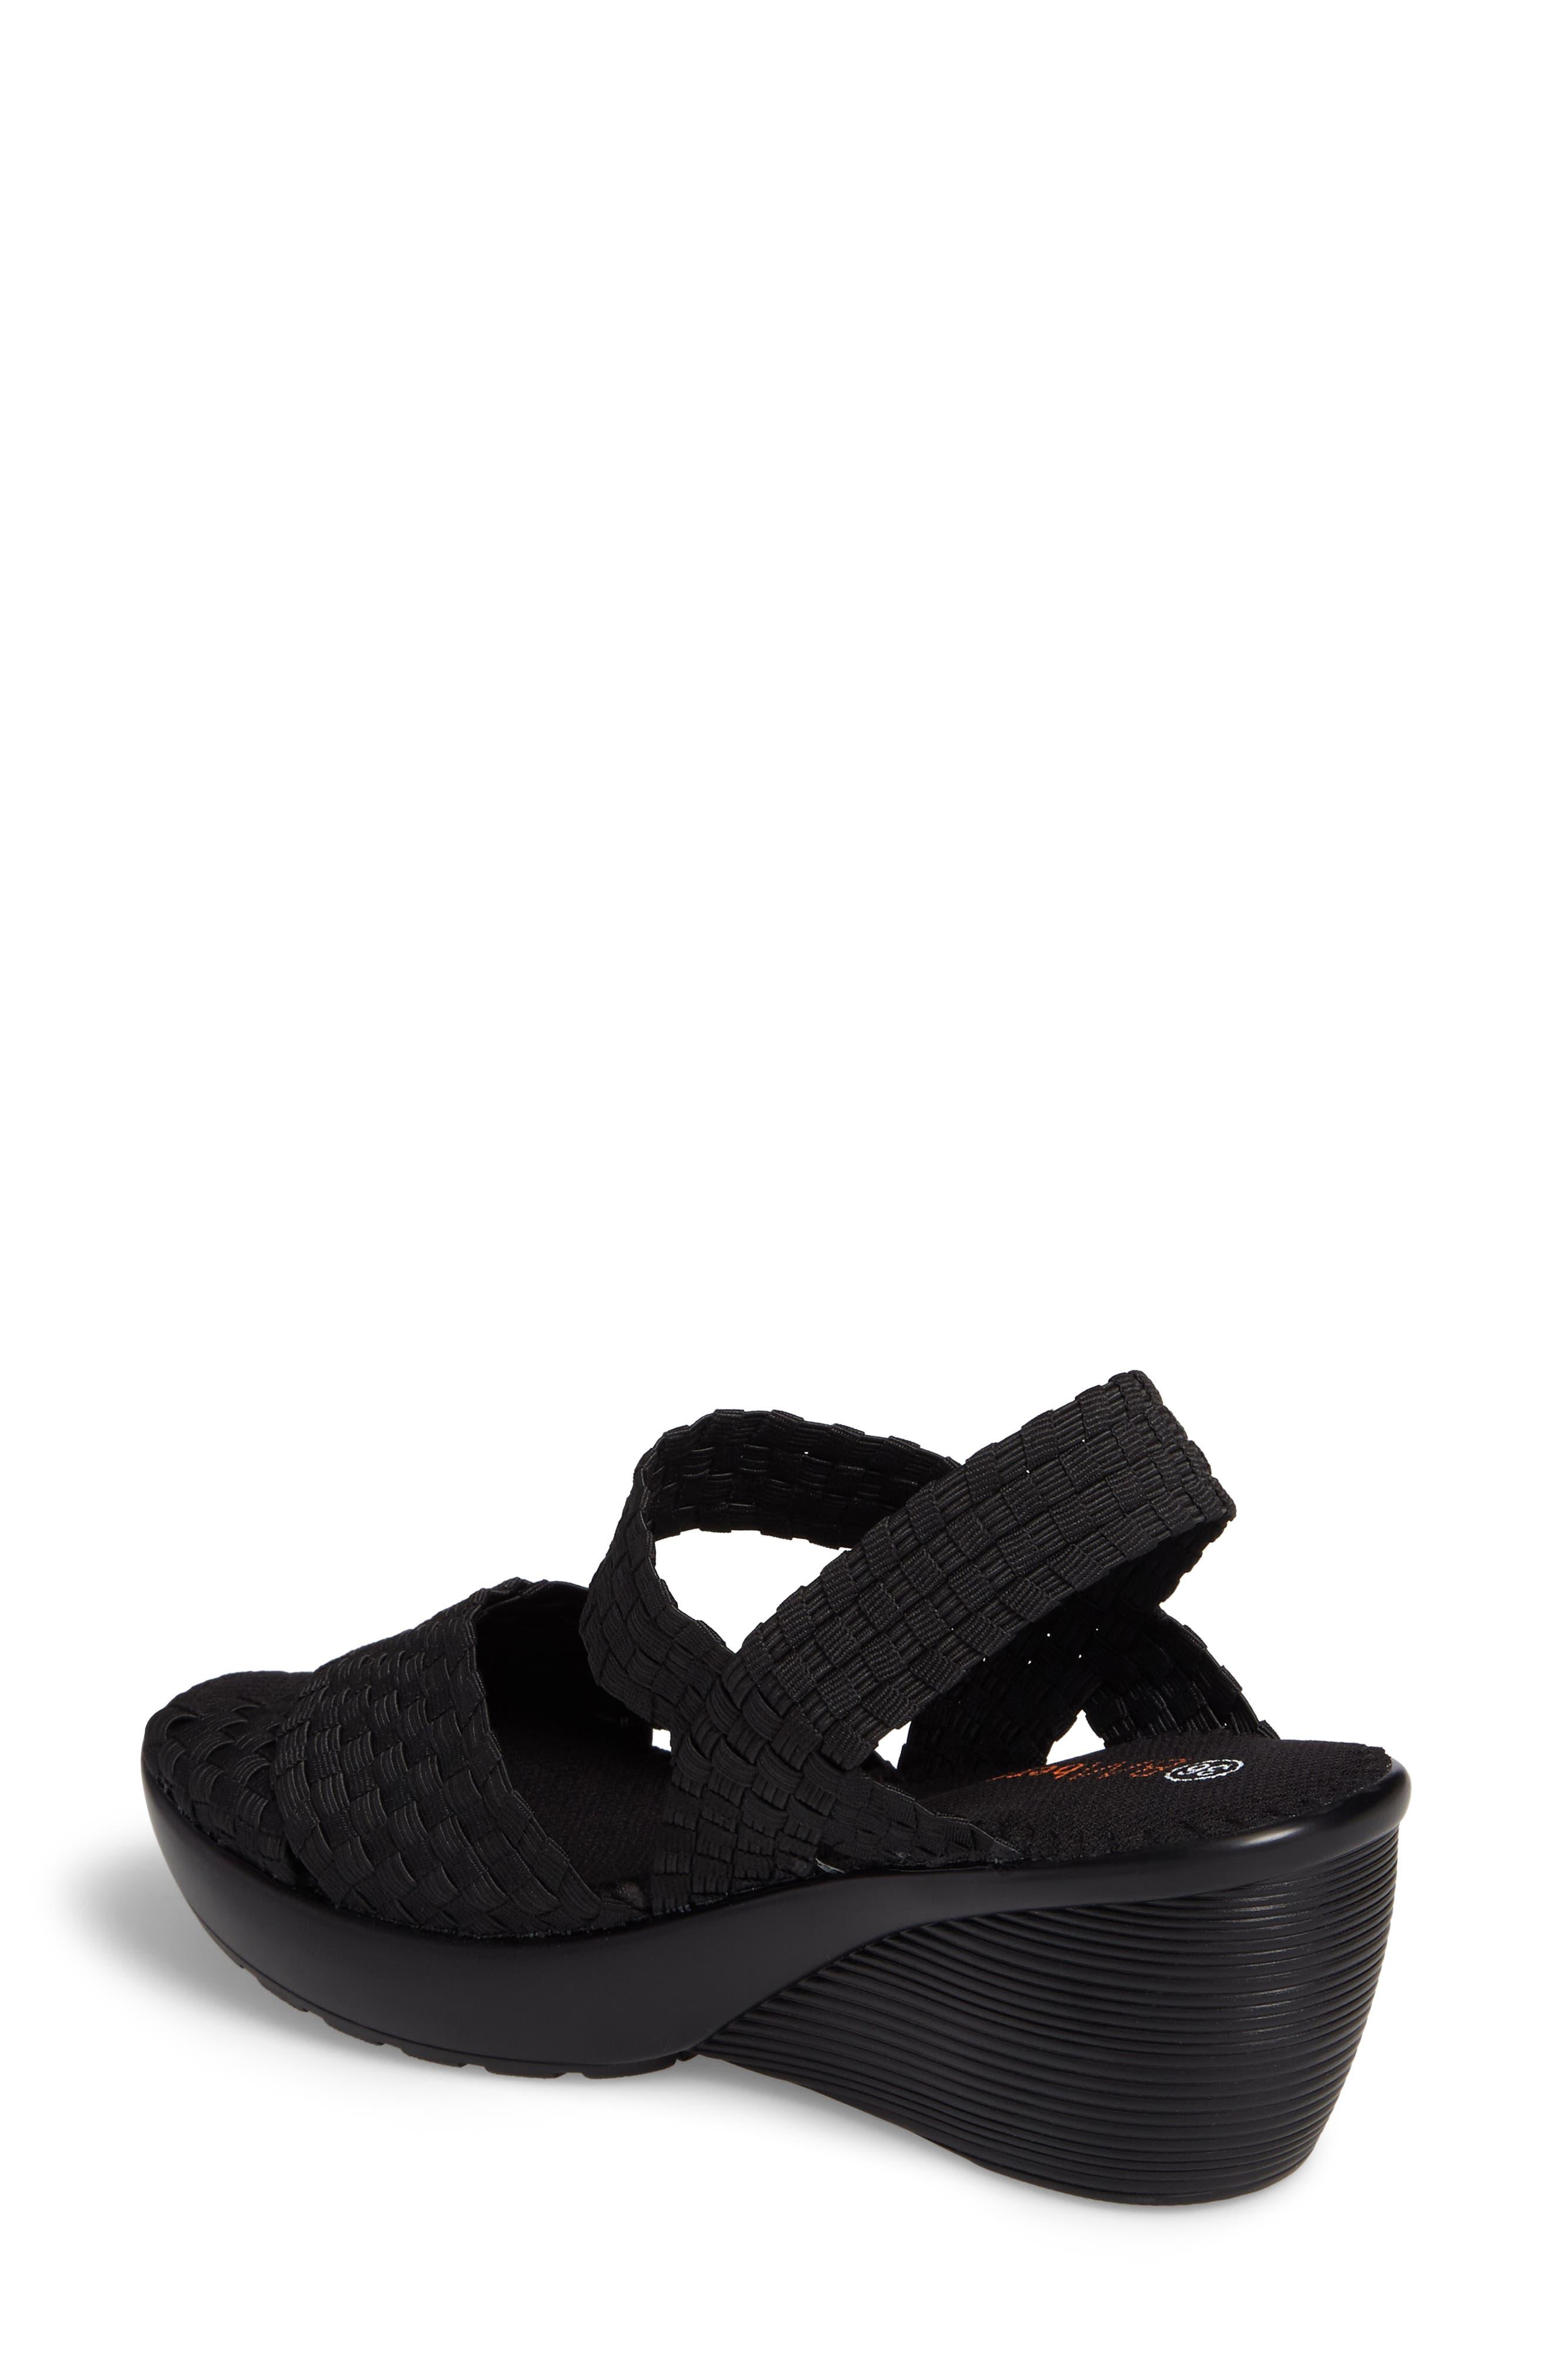 Fresh Buttercup Sandal,                             Alternate thumbnail 2, color,                             BLACK FABRIC